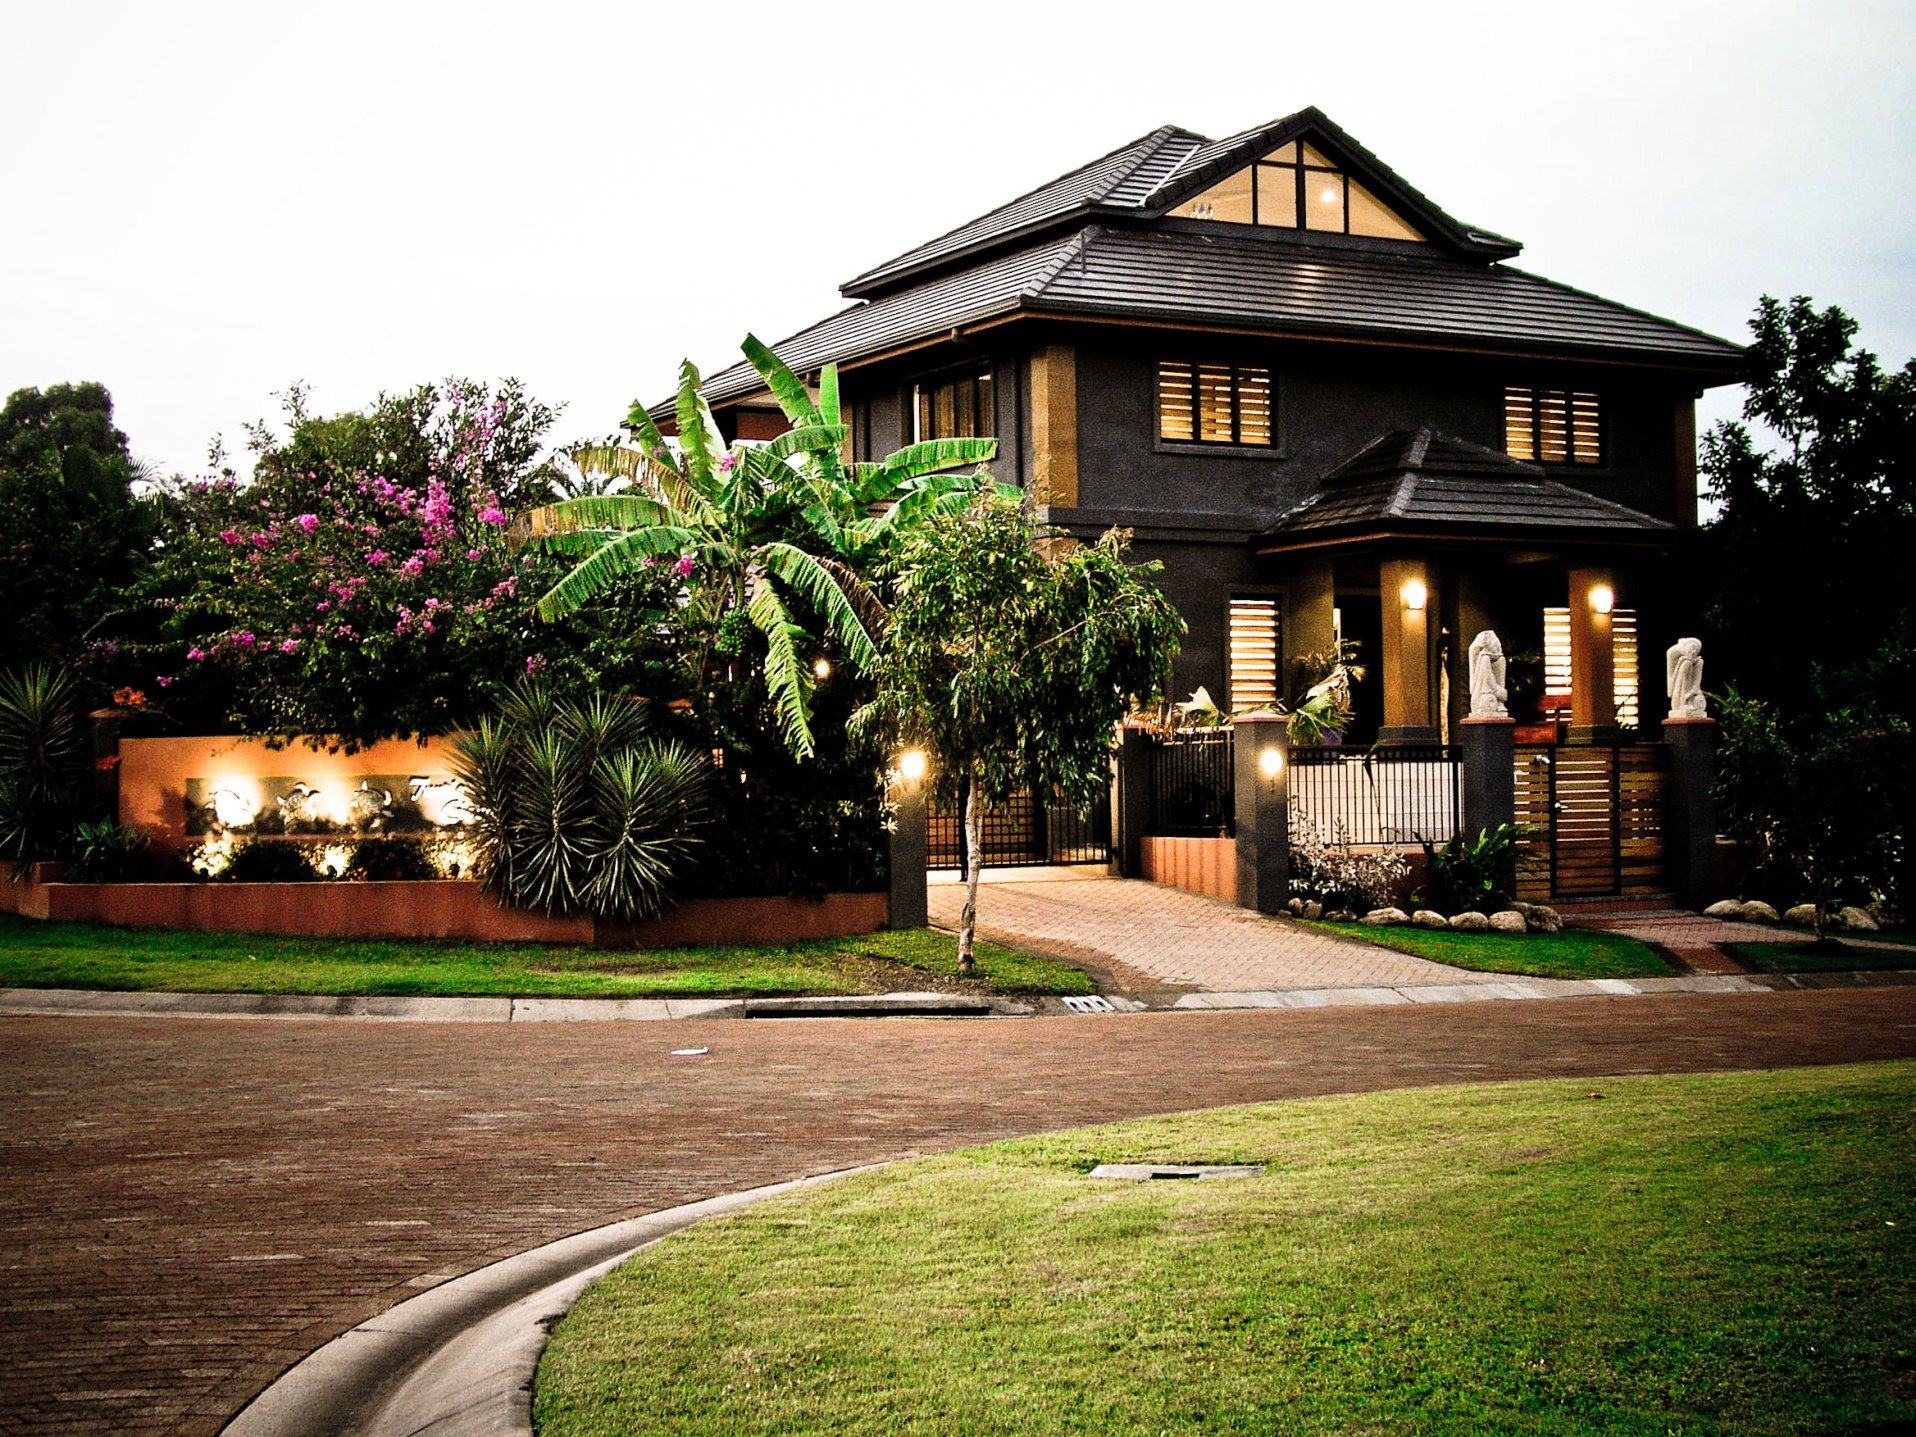 40 Beautiful House Hd Wallpapers On Wallpapersafari